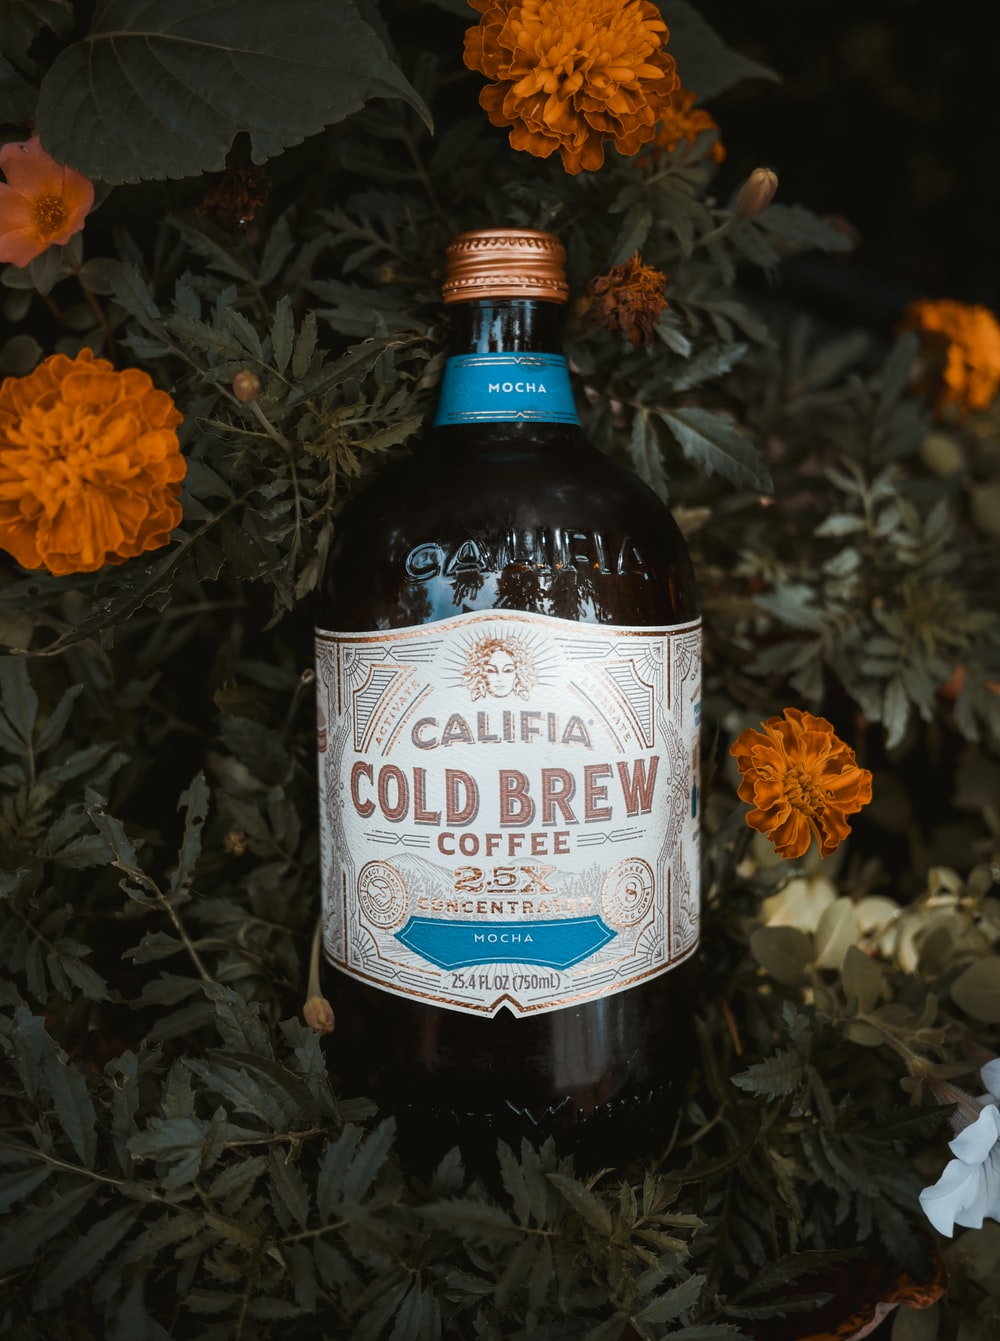 Califia Cold Brew Coffee bottle